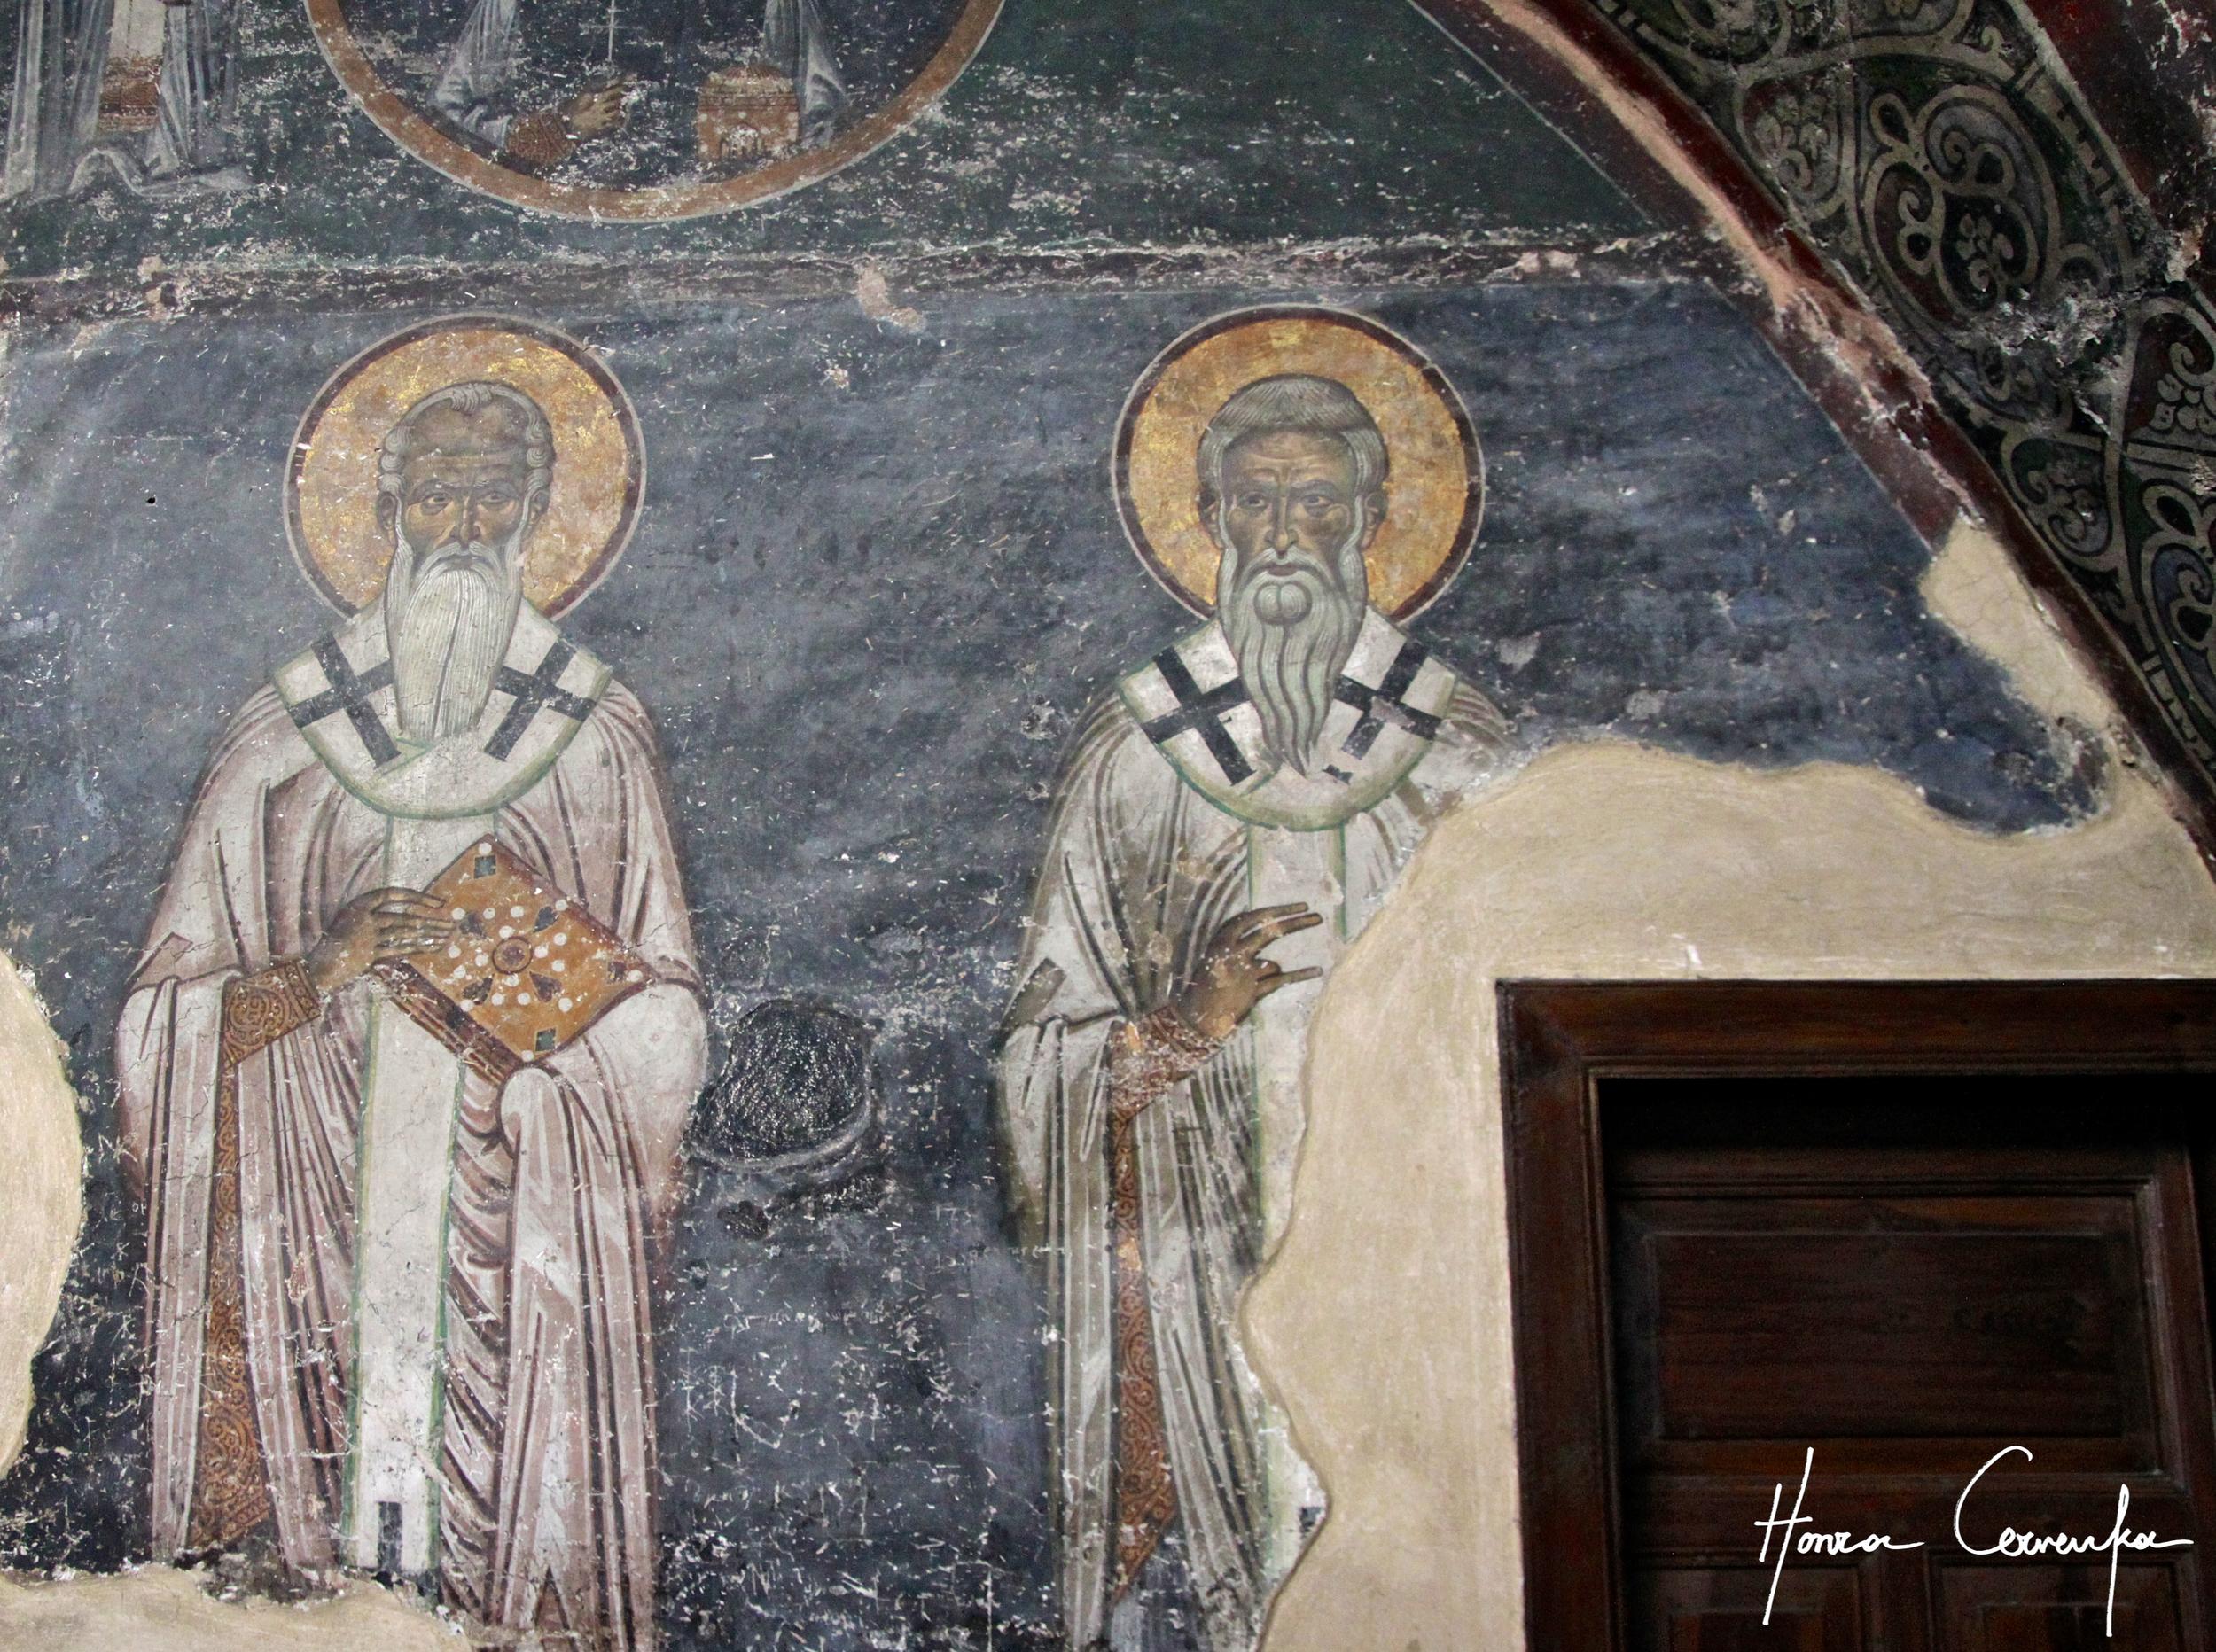 Greece-Patmos-Monastery-fresco4-Honza-Cervenka